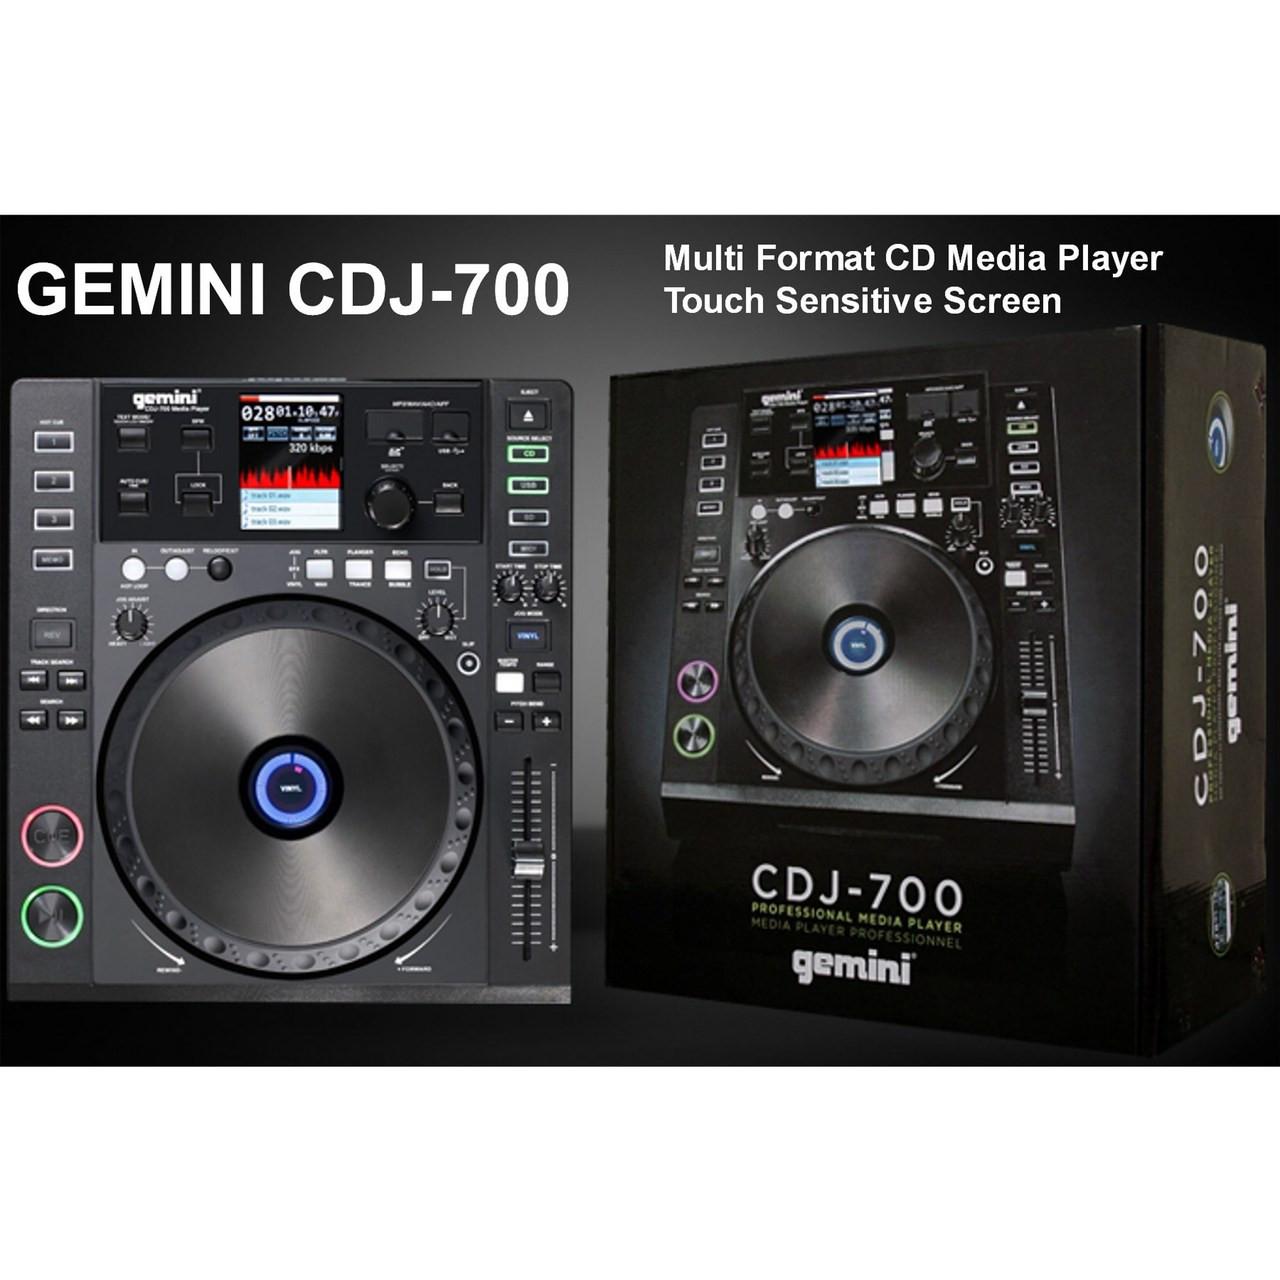 GEMINI CDJ-700 CD USB SD Media Console $20 Instant Coupon use Promo Code:  $20-OFF